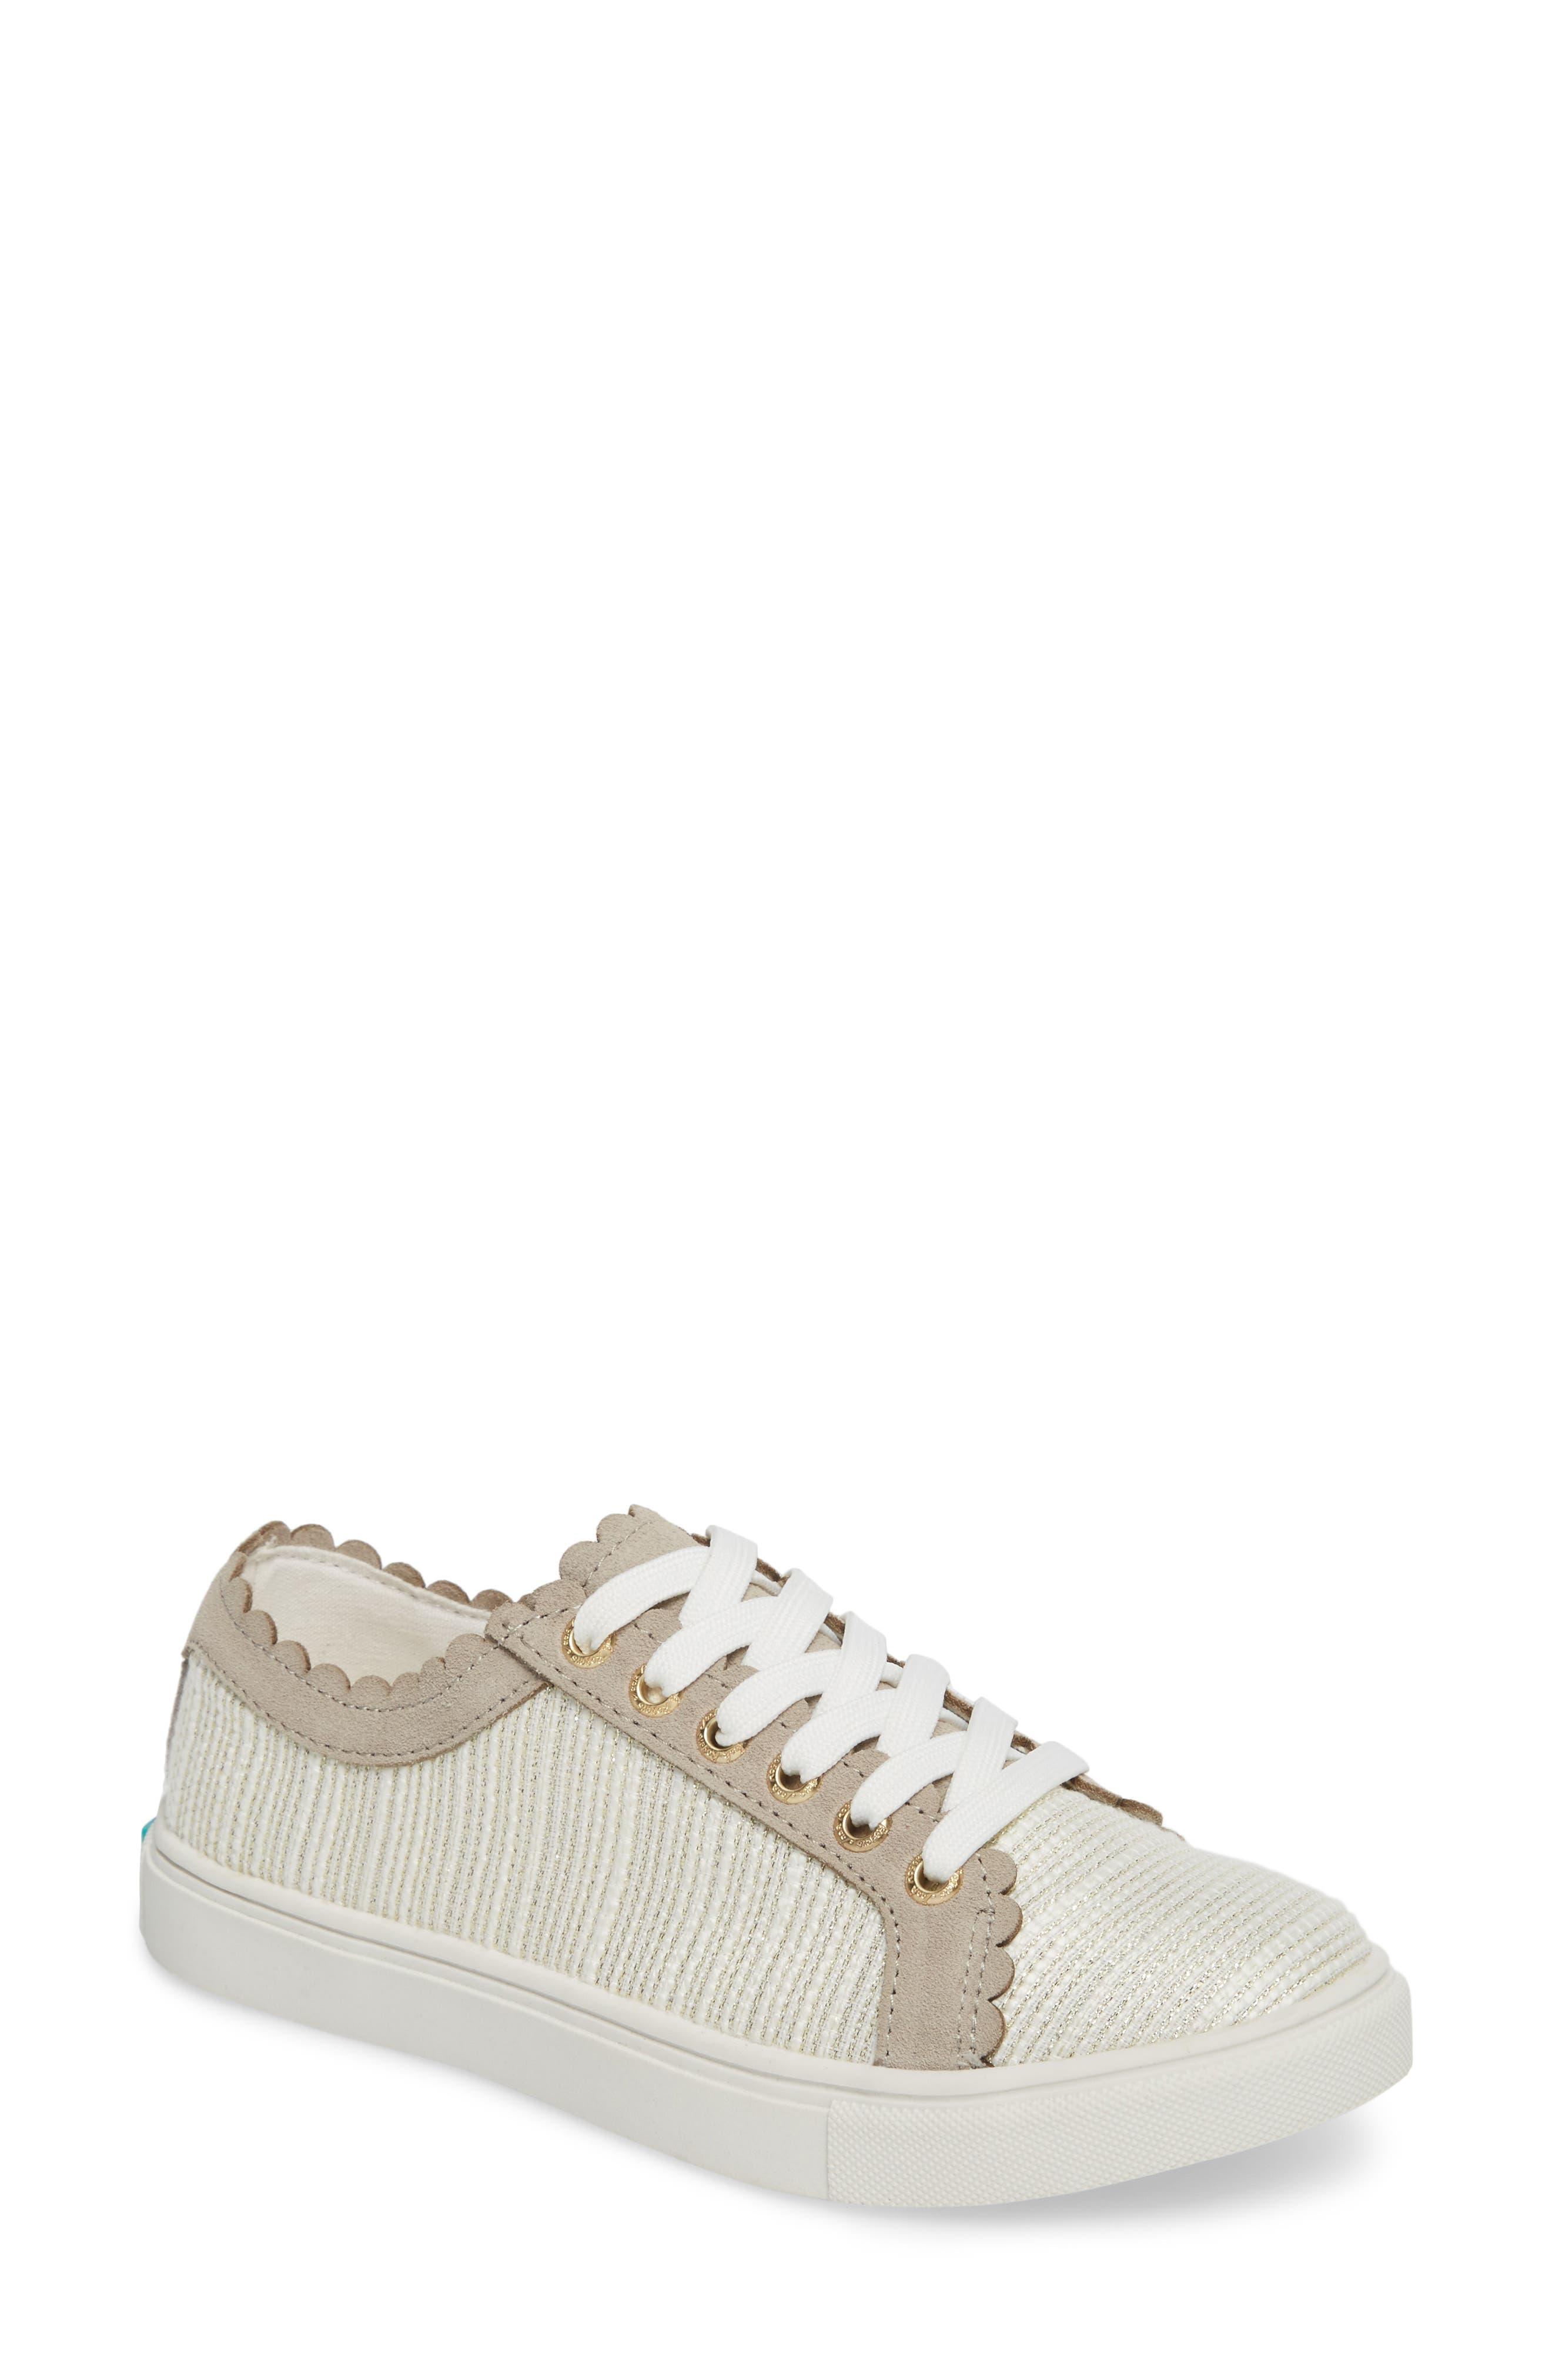 Teagan Sneaker,                         Main,                         color, Ecru